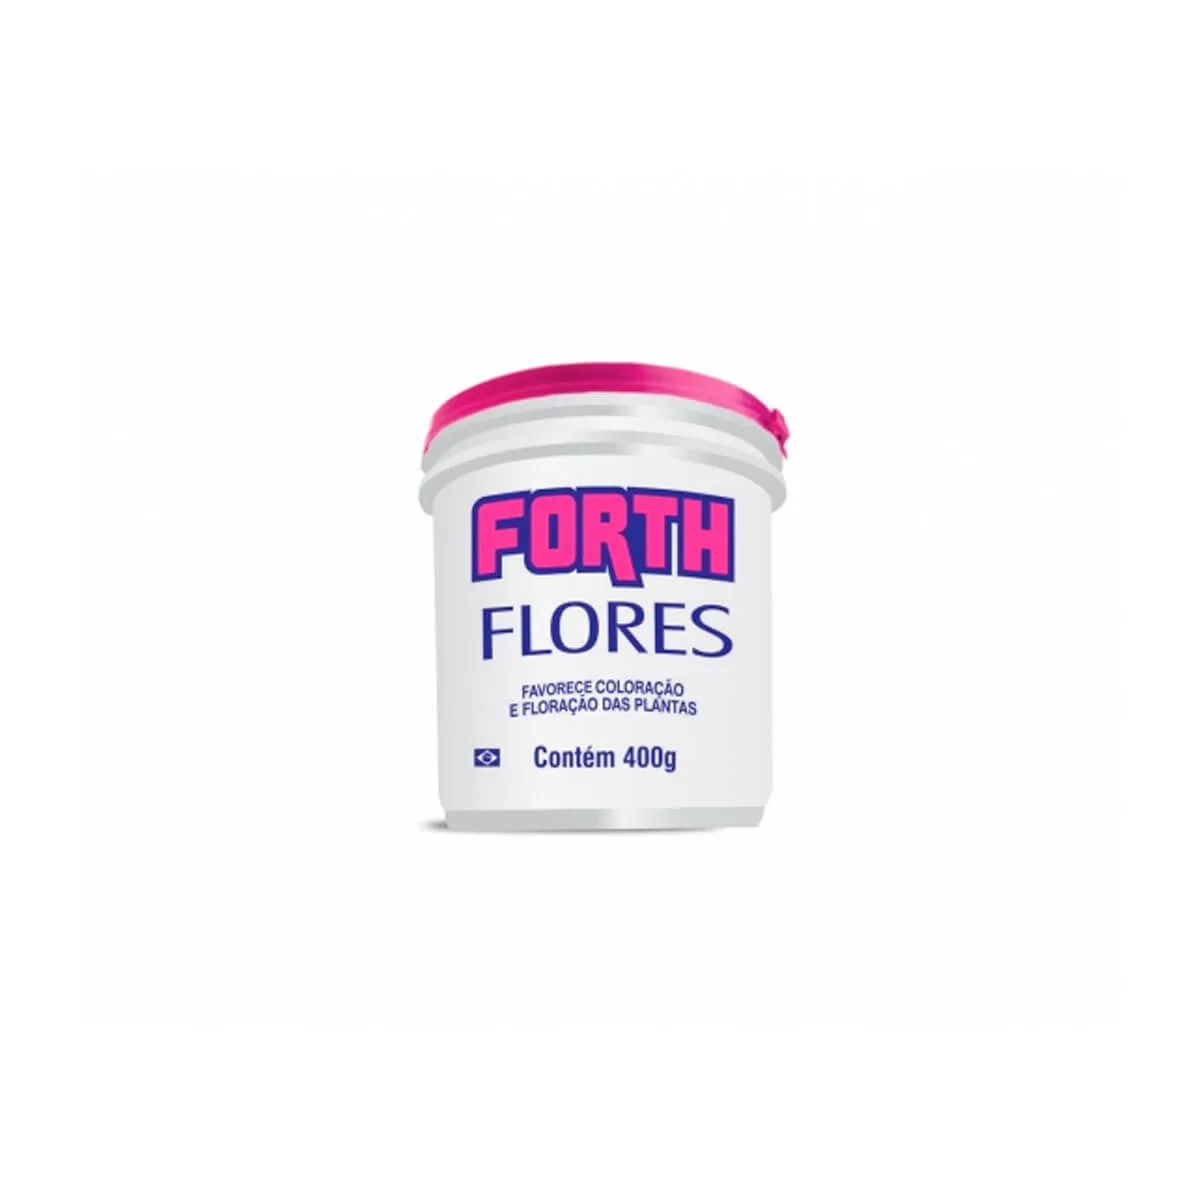 Fertilizante para plantas Forth Flores 400g  - Vasos Raiz Loja Oficial